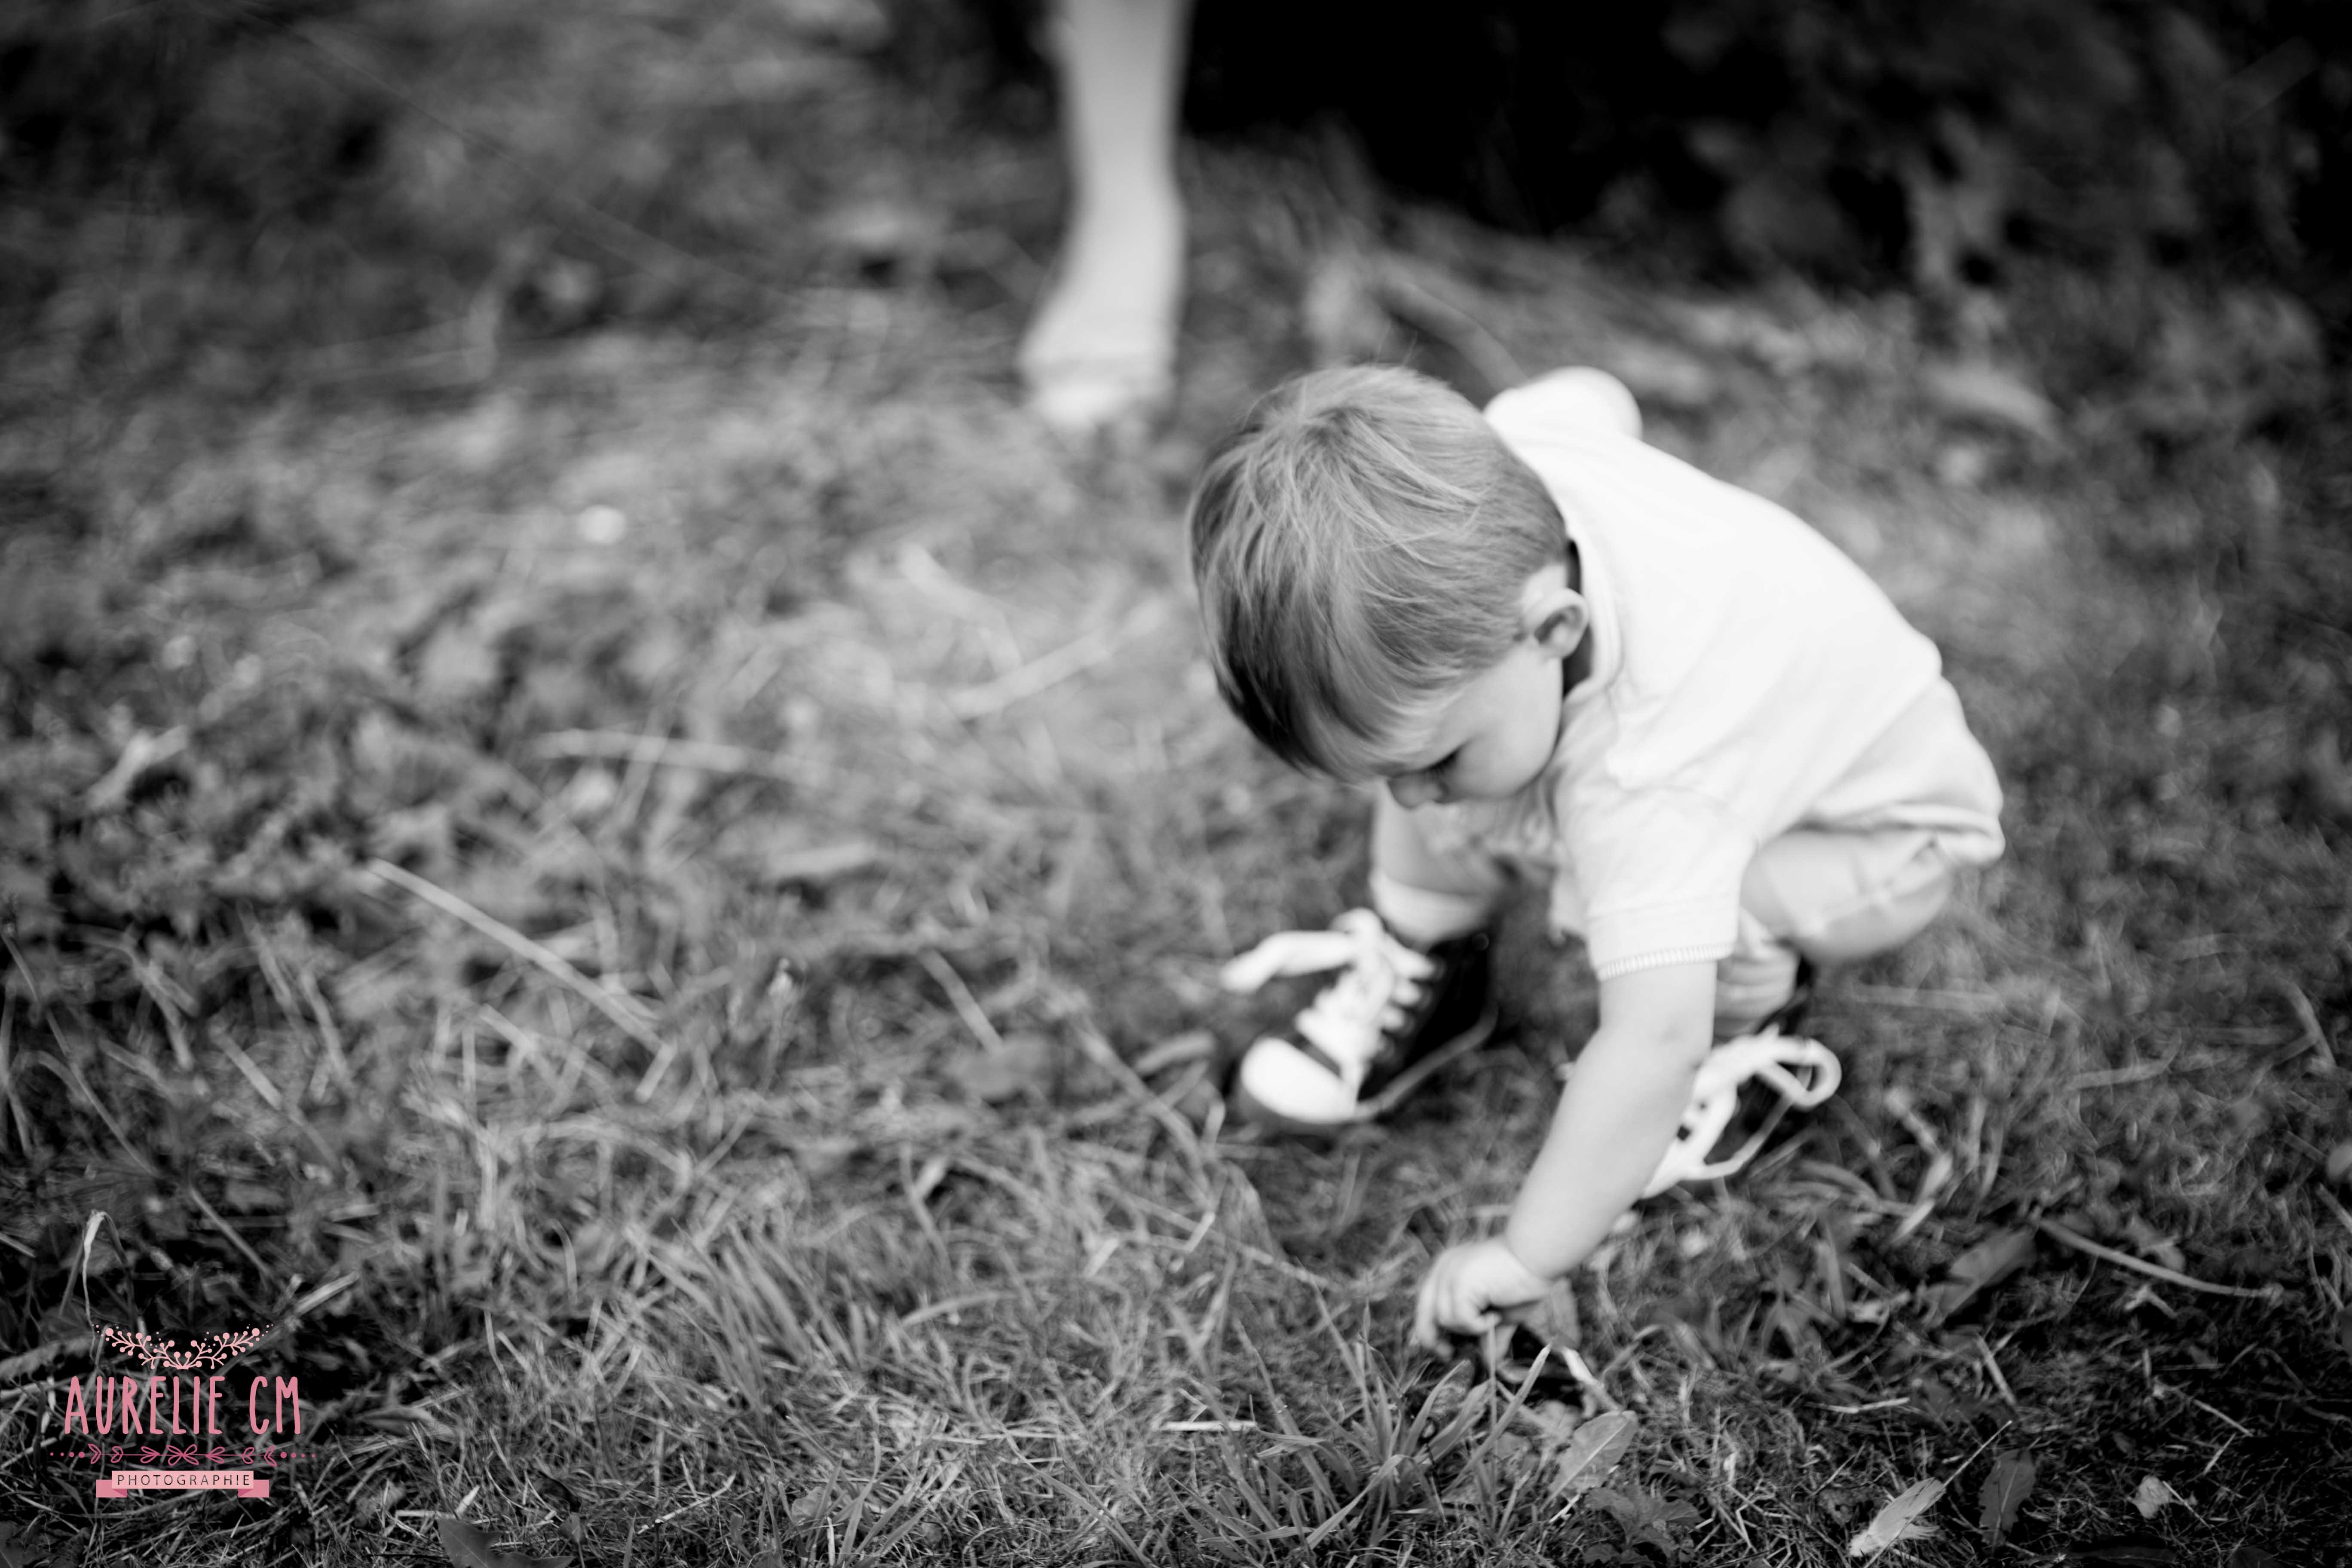 photographe le havre